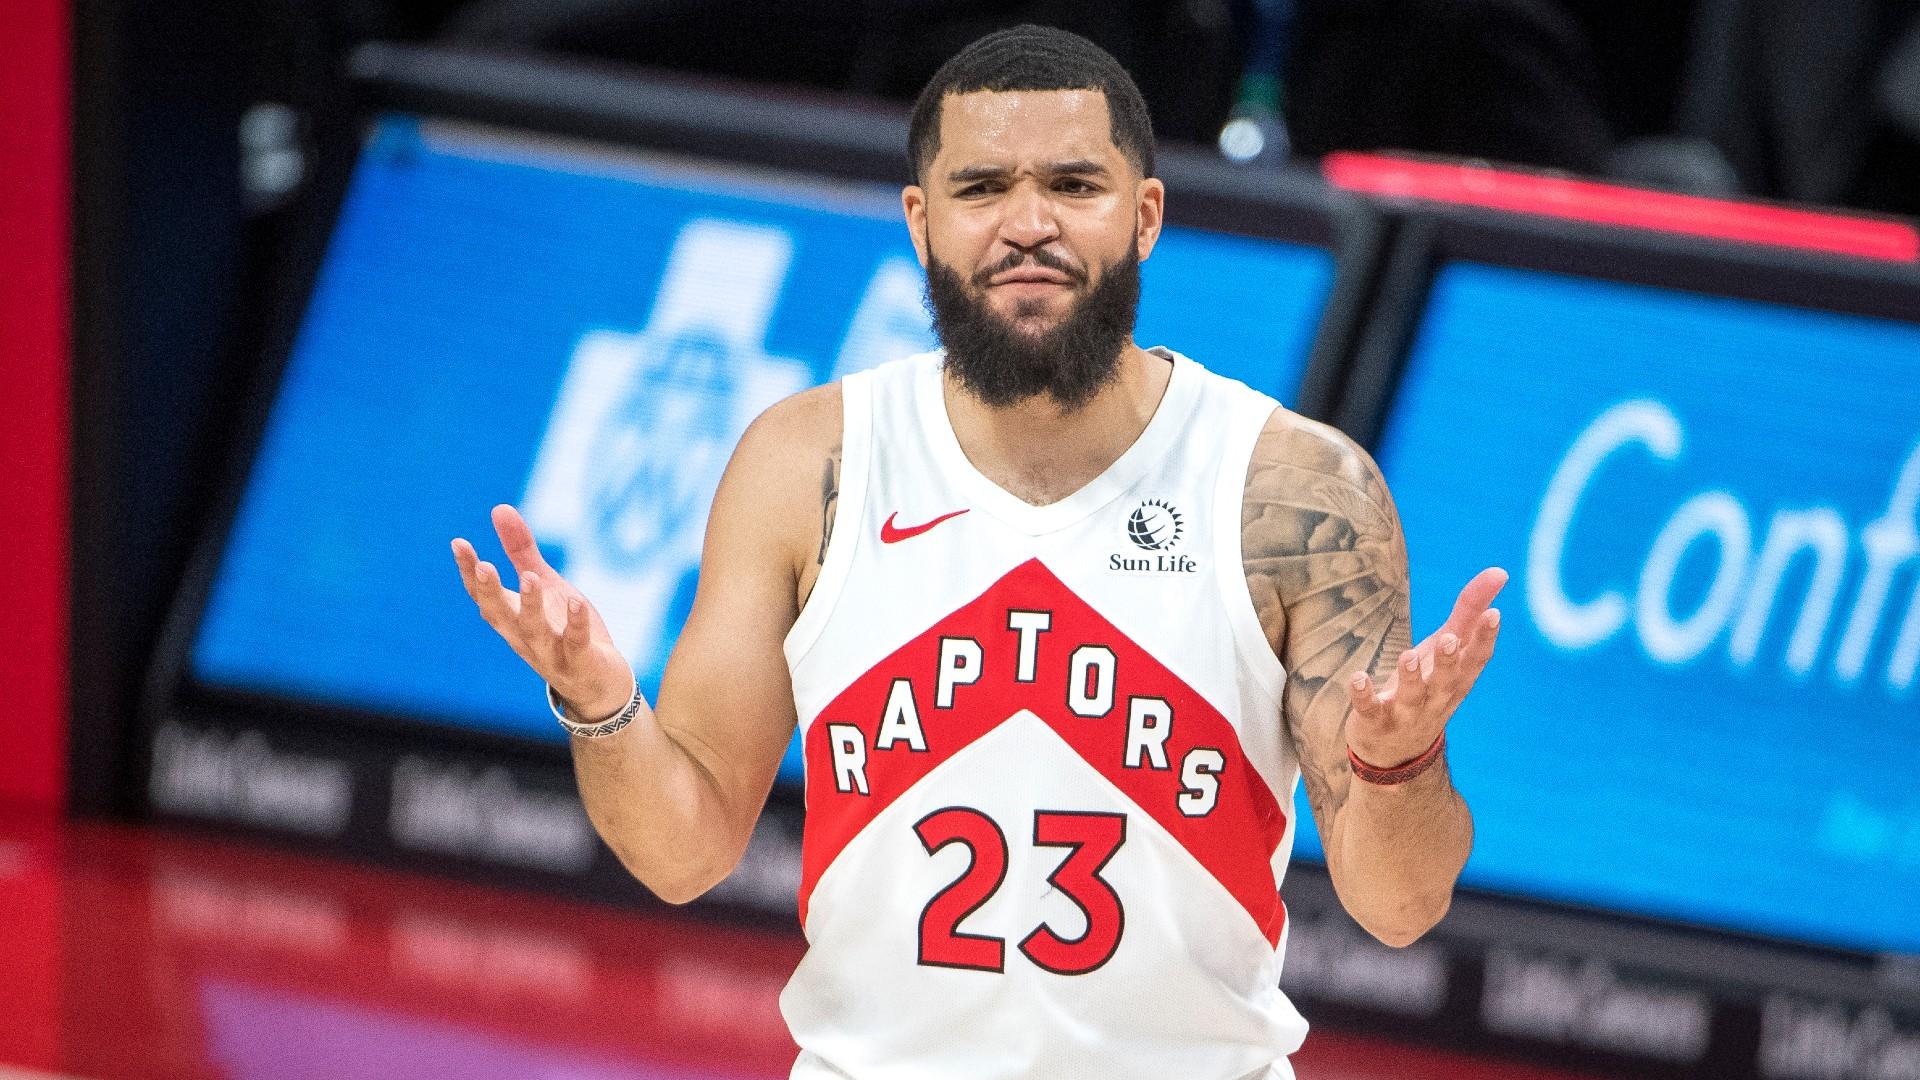 Fred VanVleet laughed after the Raptors-Lakers clash